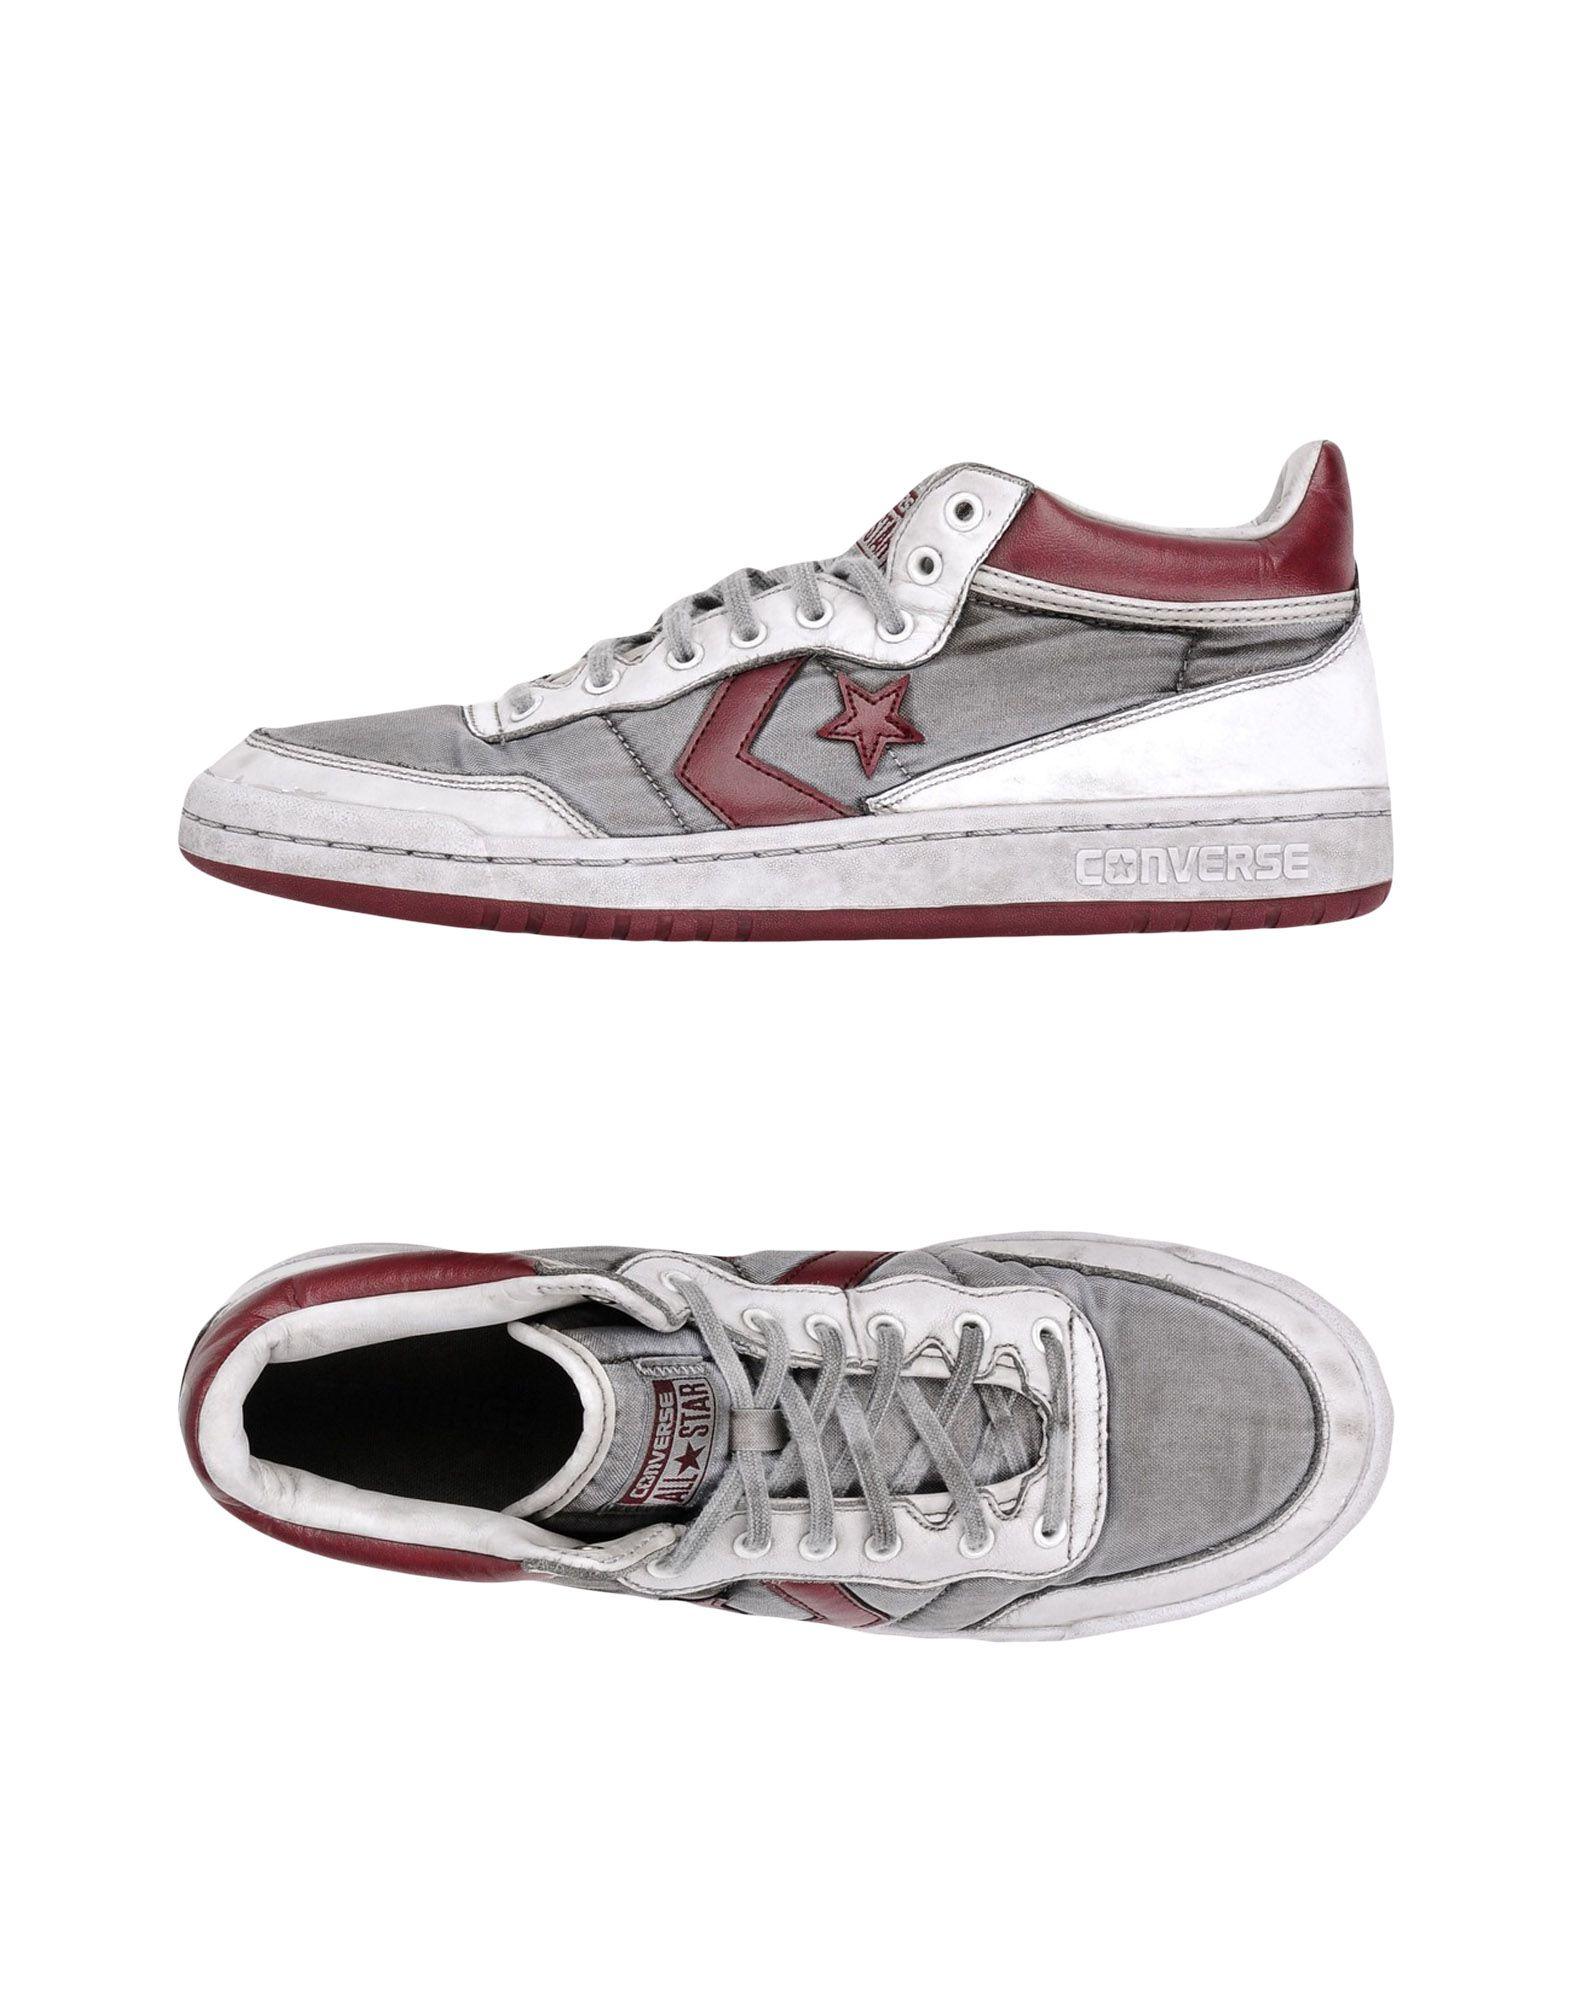 Rabatt echte Schuhe Break Converse Limited Edition Fast Break Schuhe 83 Mid Nylon/Leather Ltd  11378112WX e05348